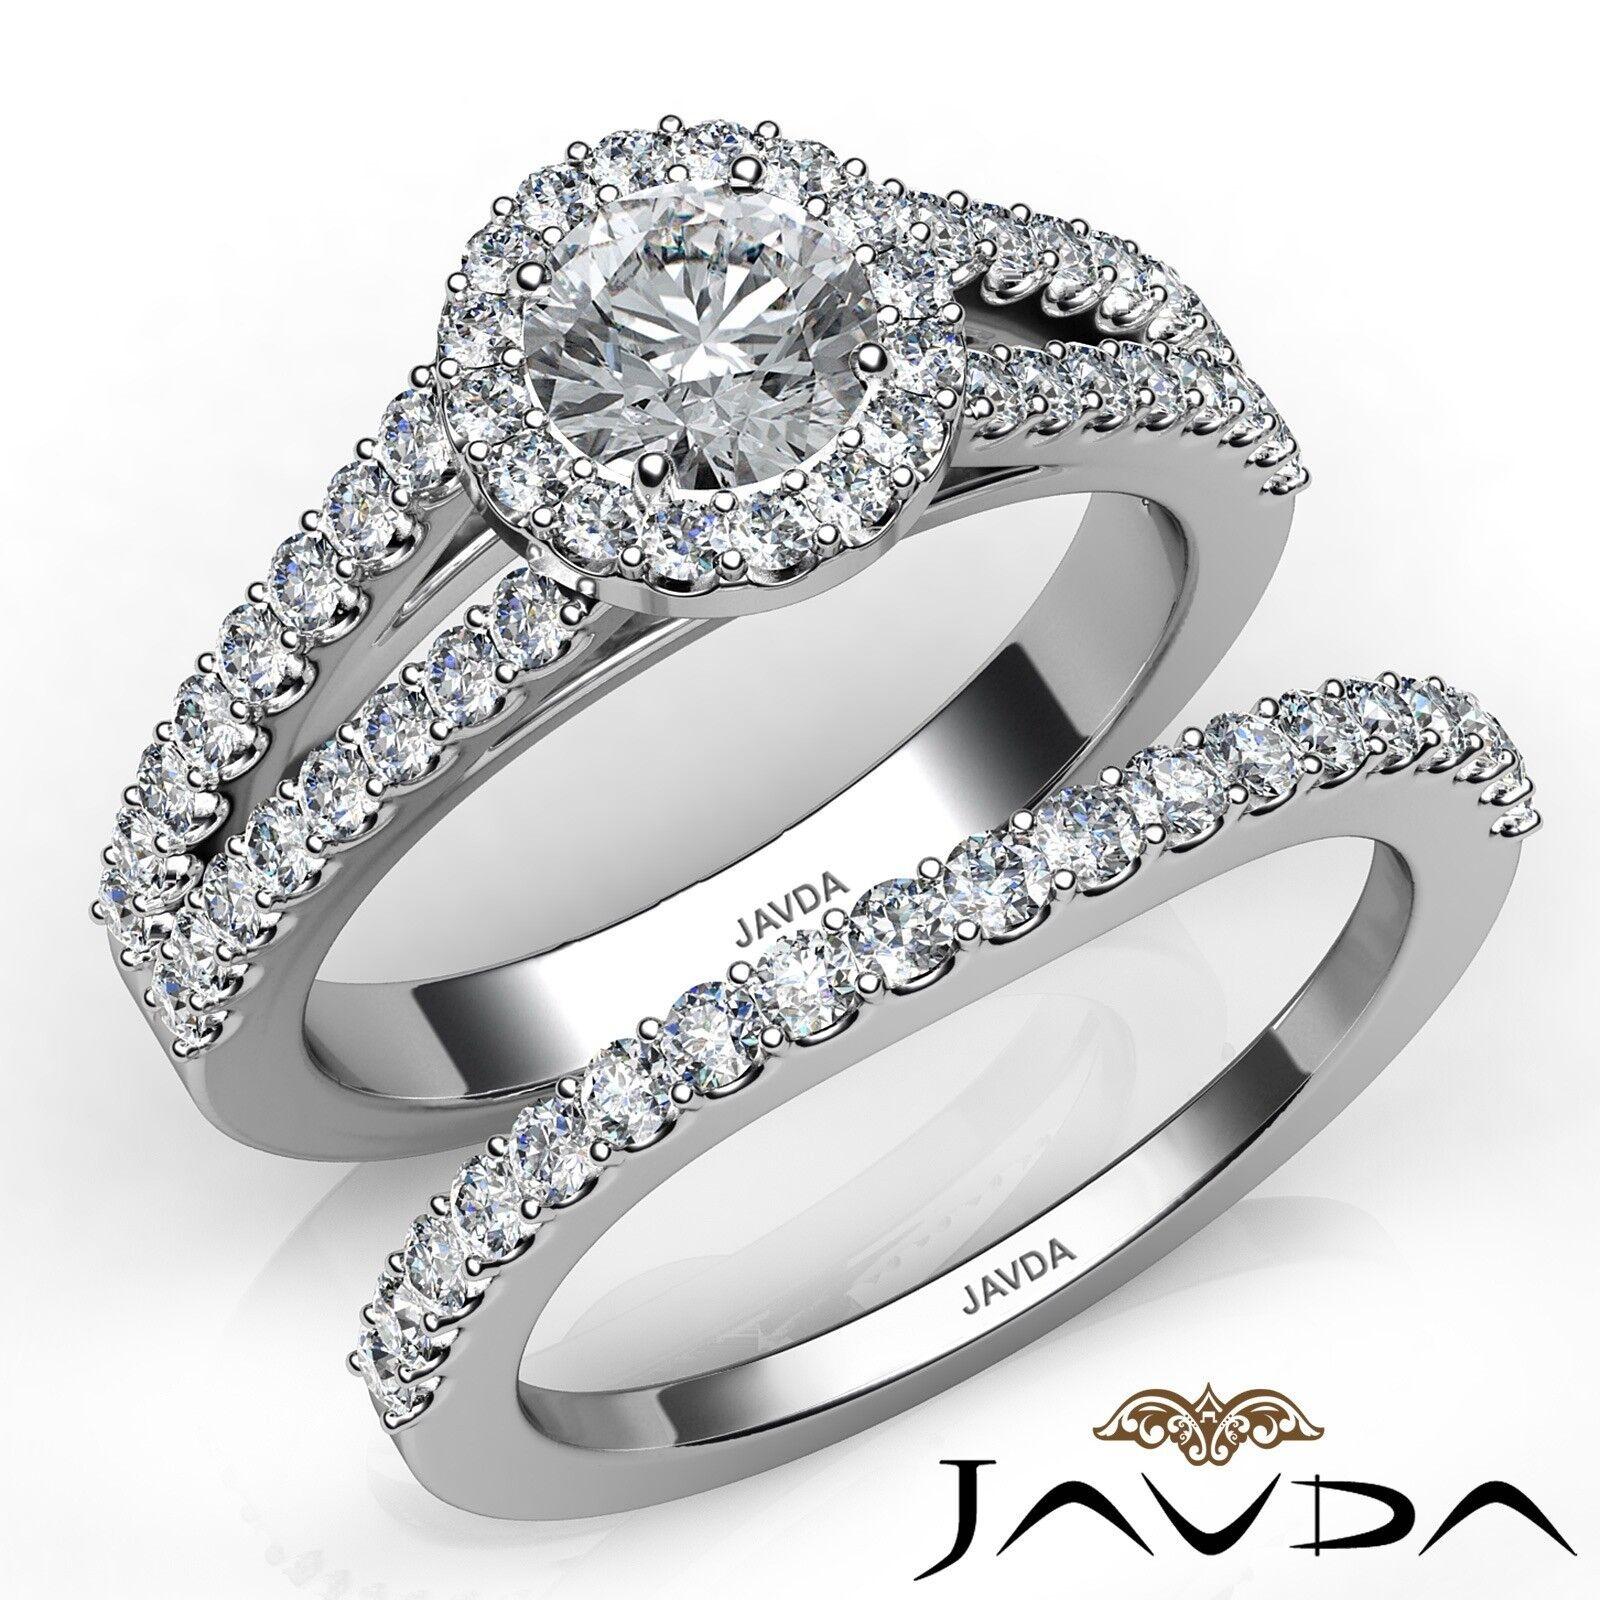 1.85ctw Luxurious Wedding Bridal Round Diamond Engagement Ring GIA G-VVS1 W Gold